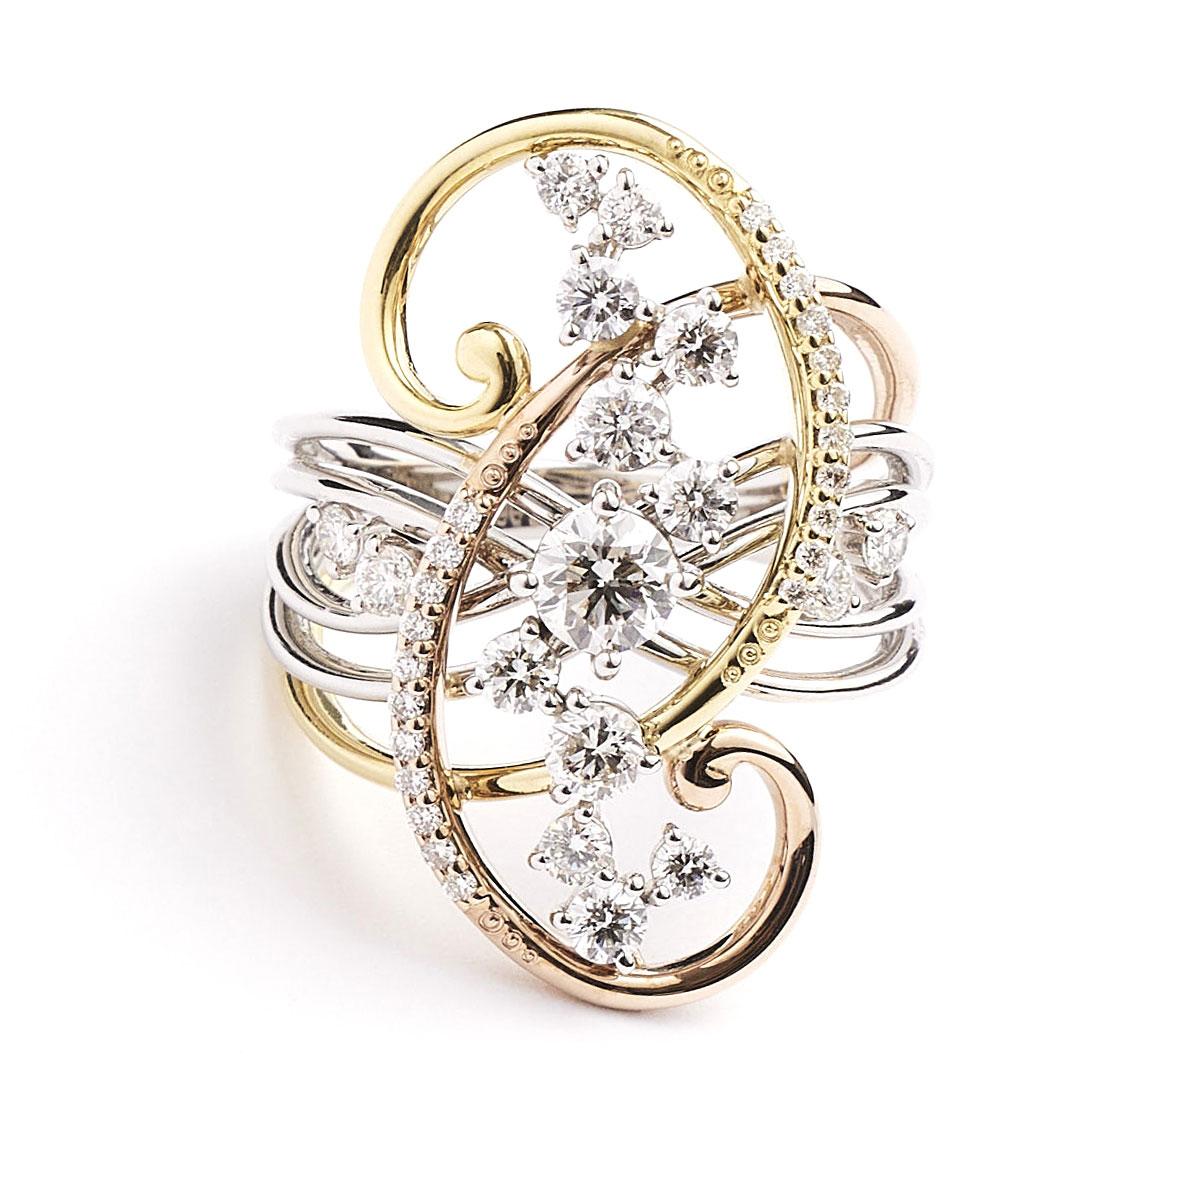 Pt900/K18 Diamond Ring